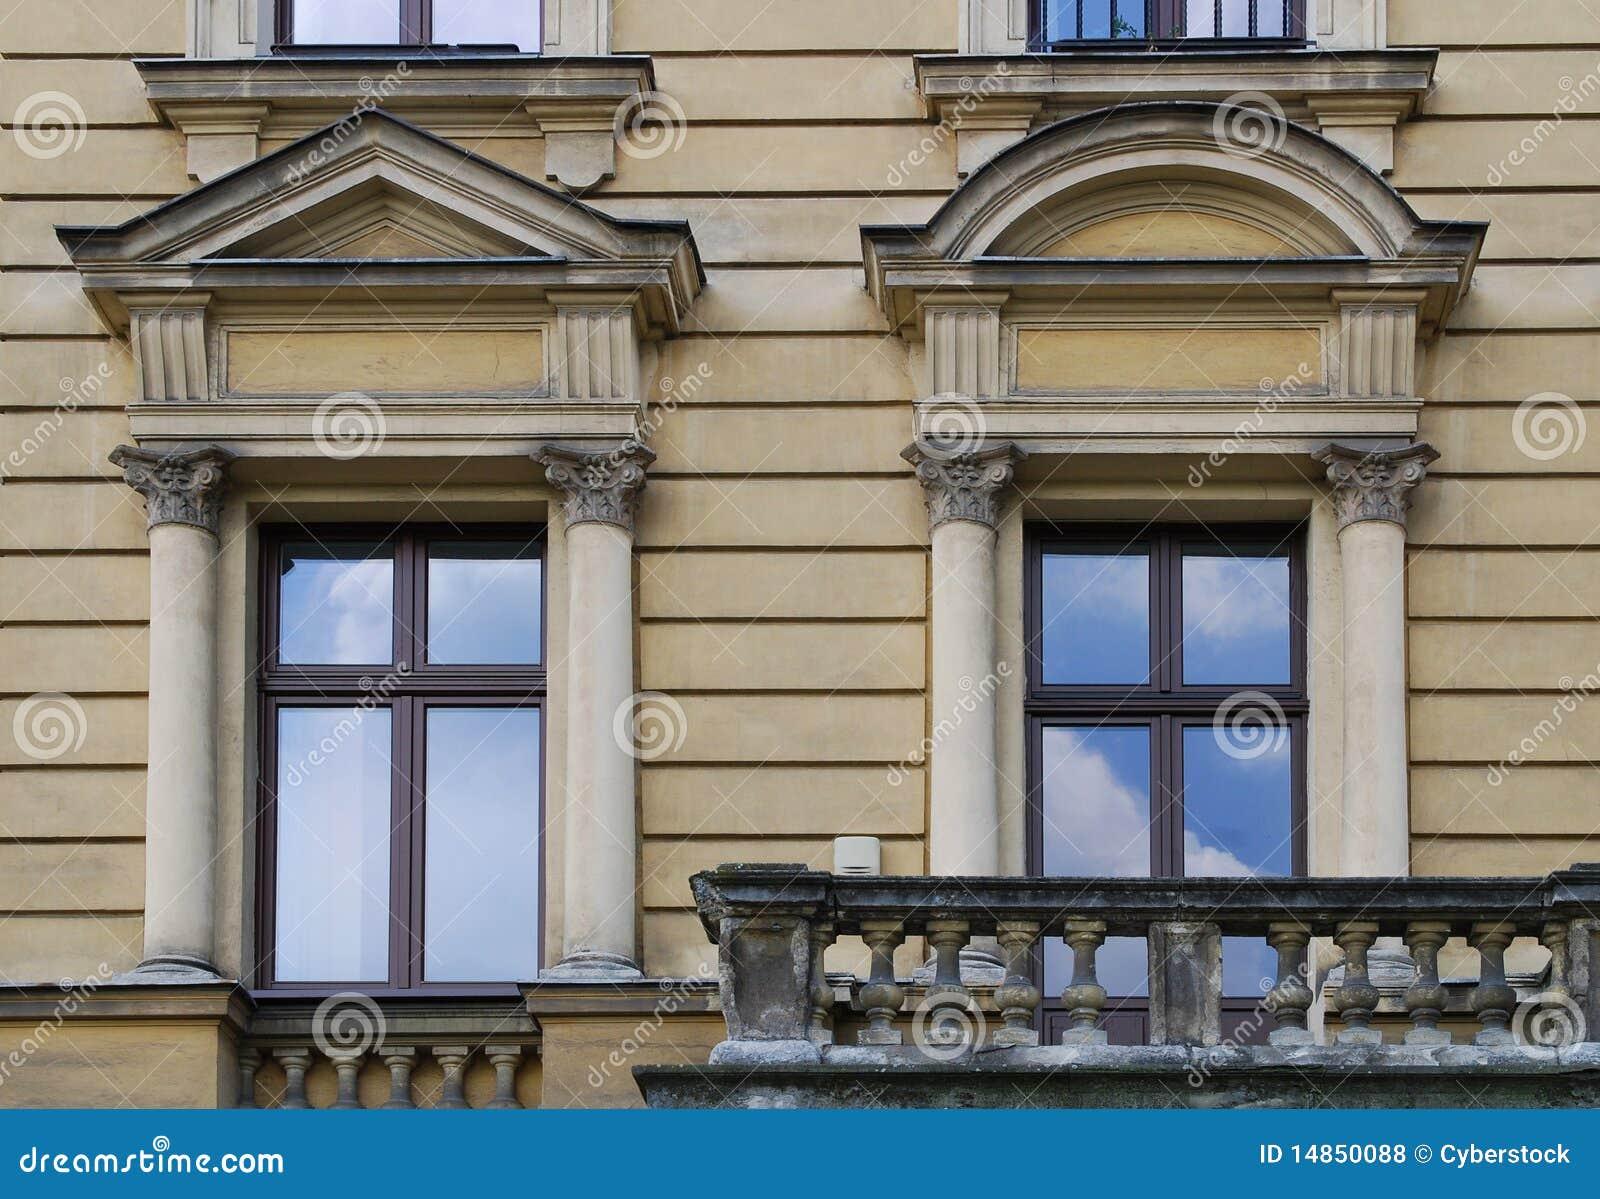 Oud huis op het belangrijkste vierkant in krakau stock foto afbeelding 14850088 - Oud gerenoveerd huis ...